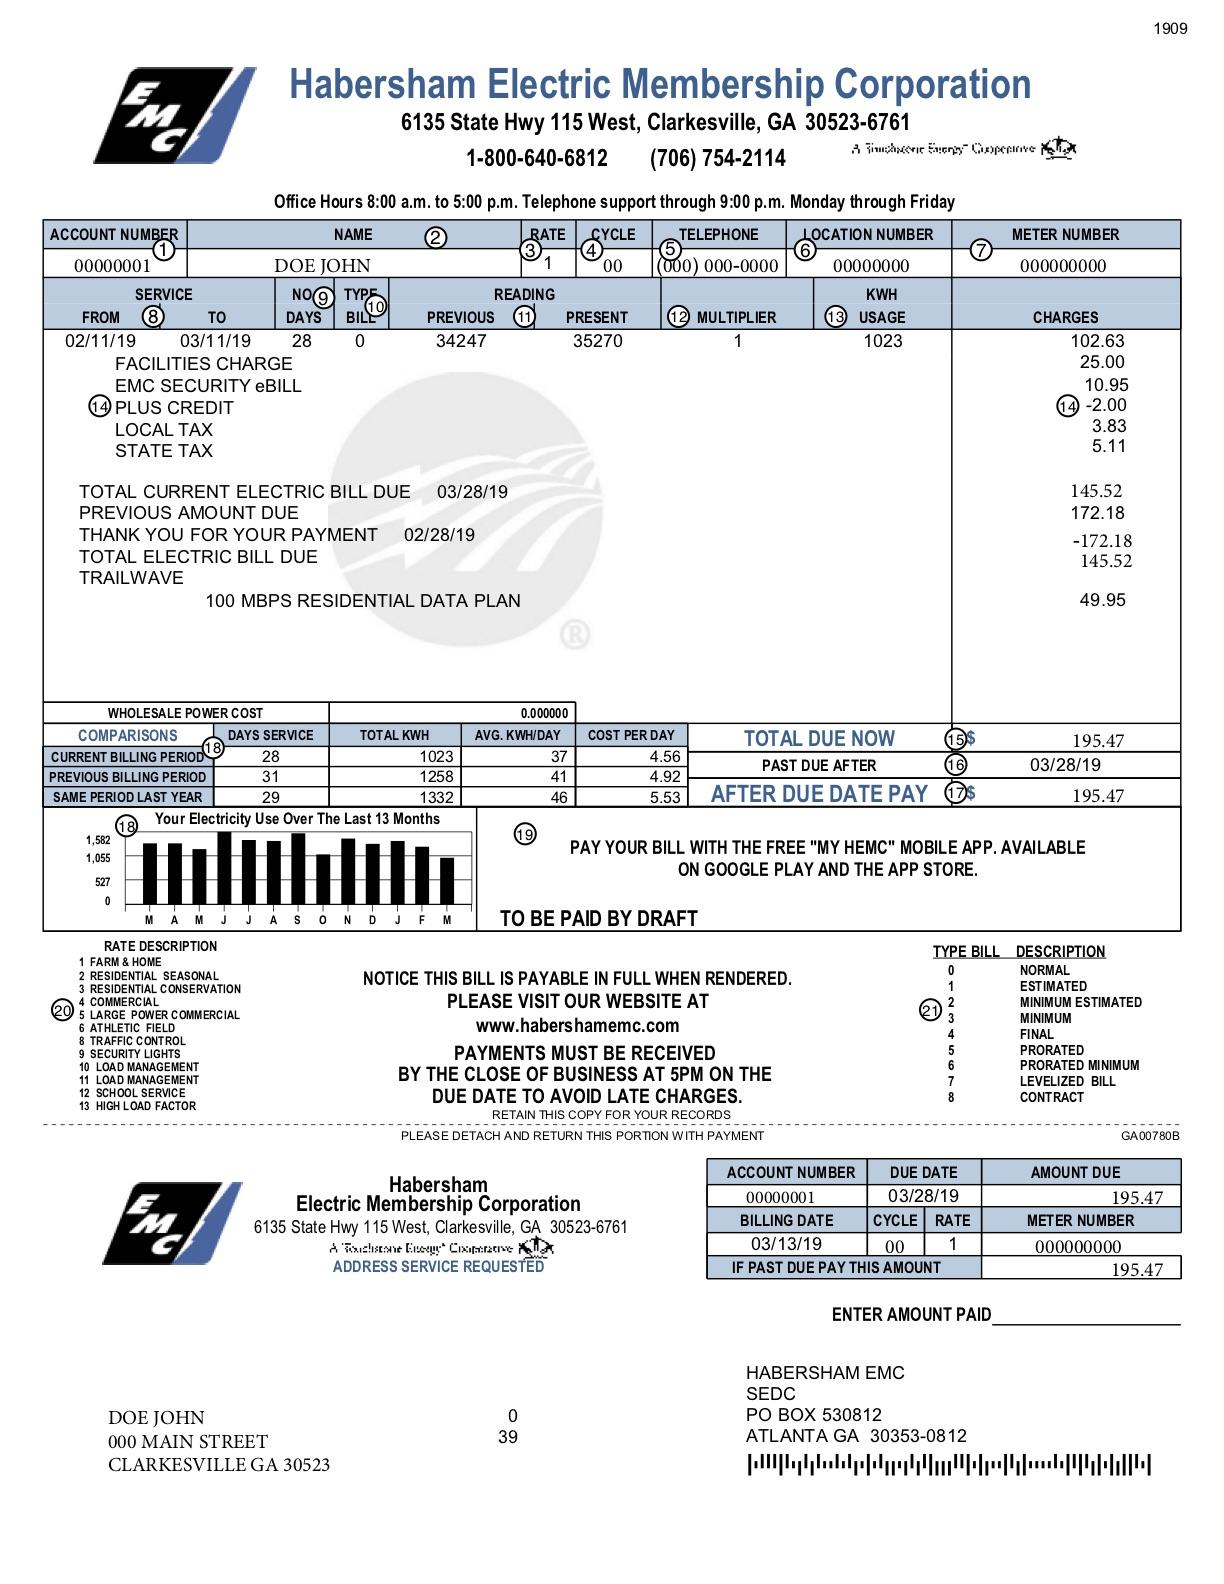 example bill document